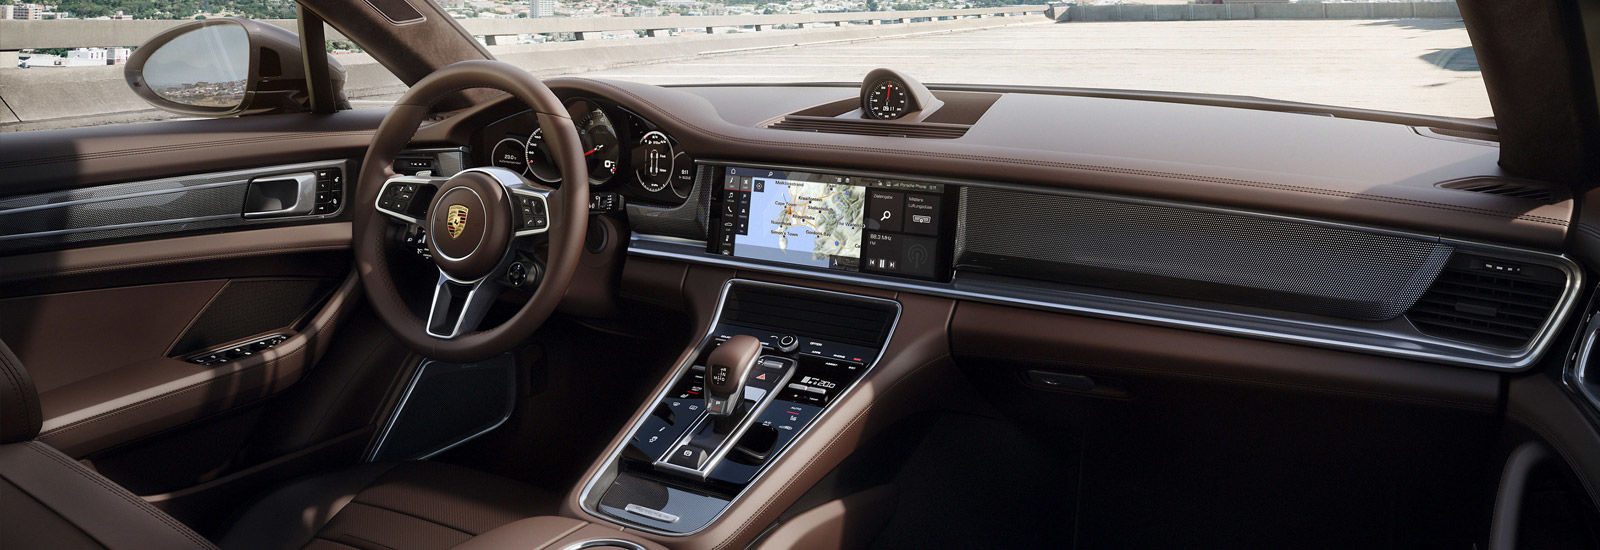 Porsche Panamera Interior Specs